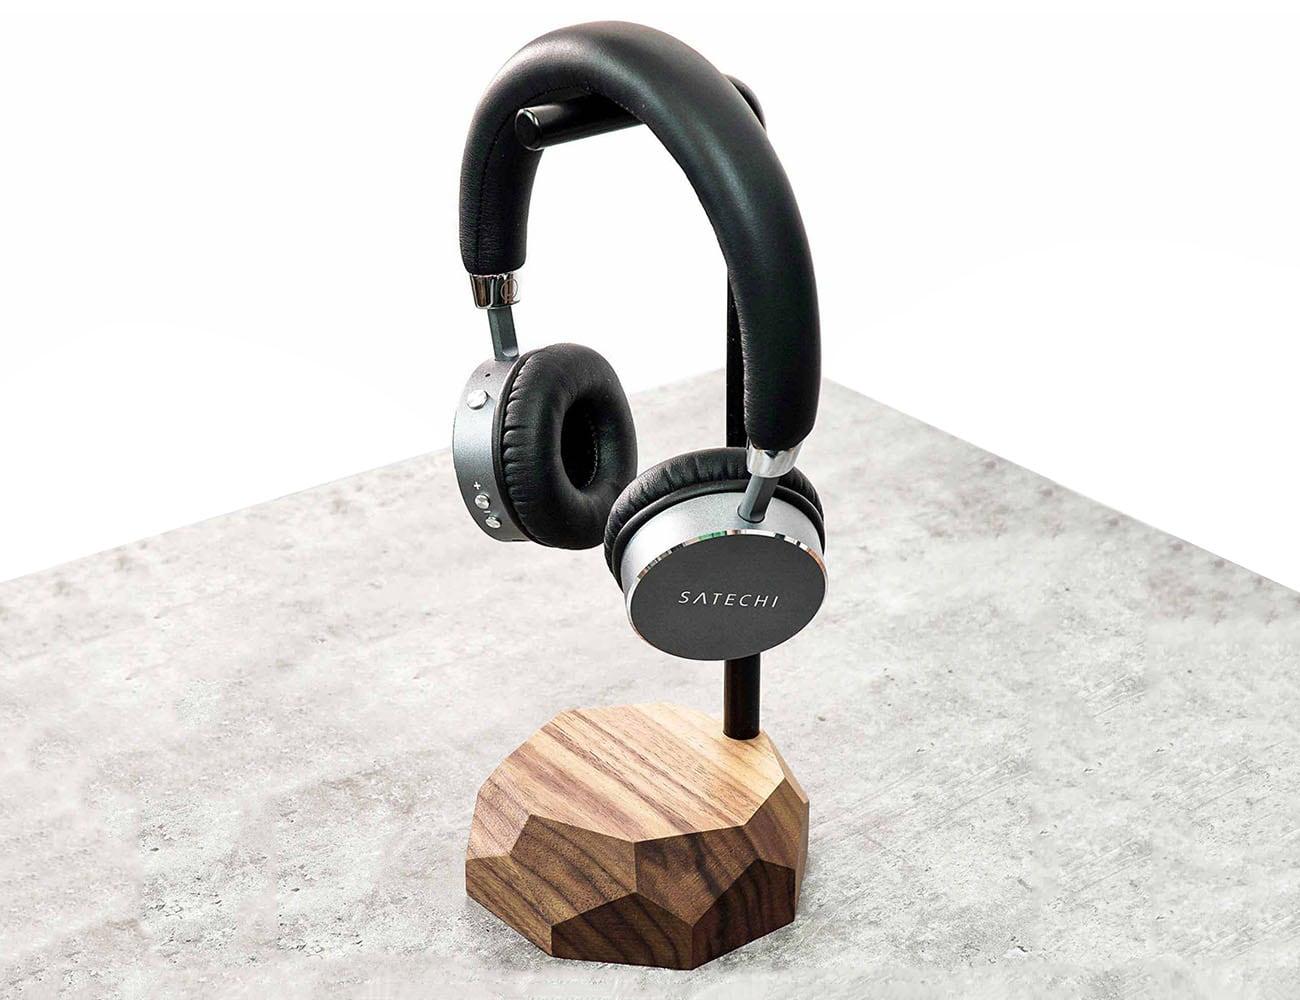 Oakywood Wooden Headphone Stand